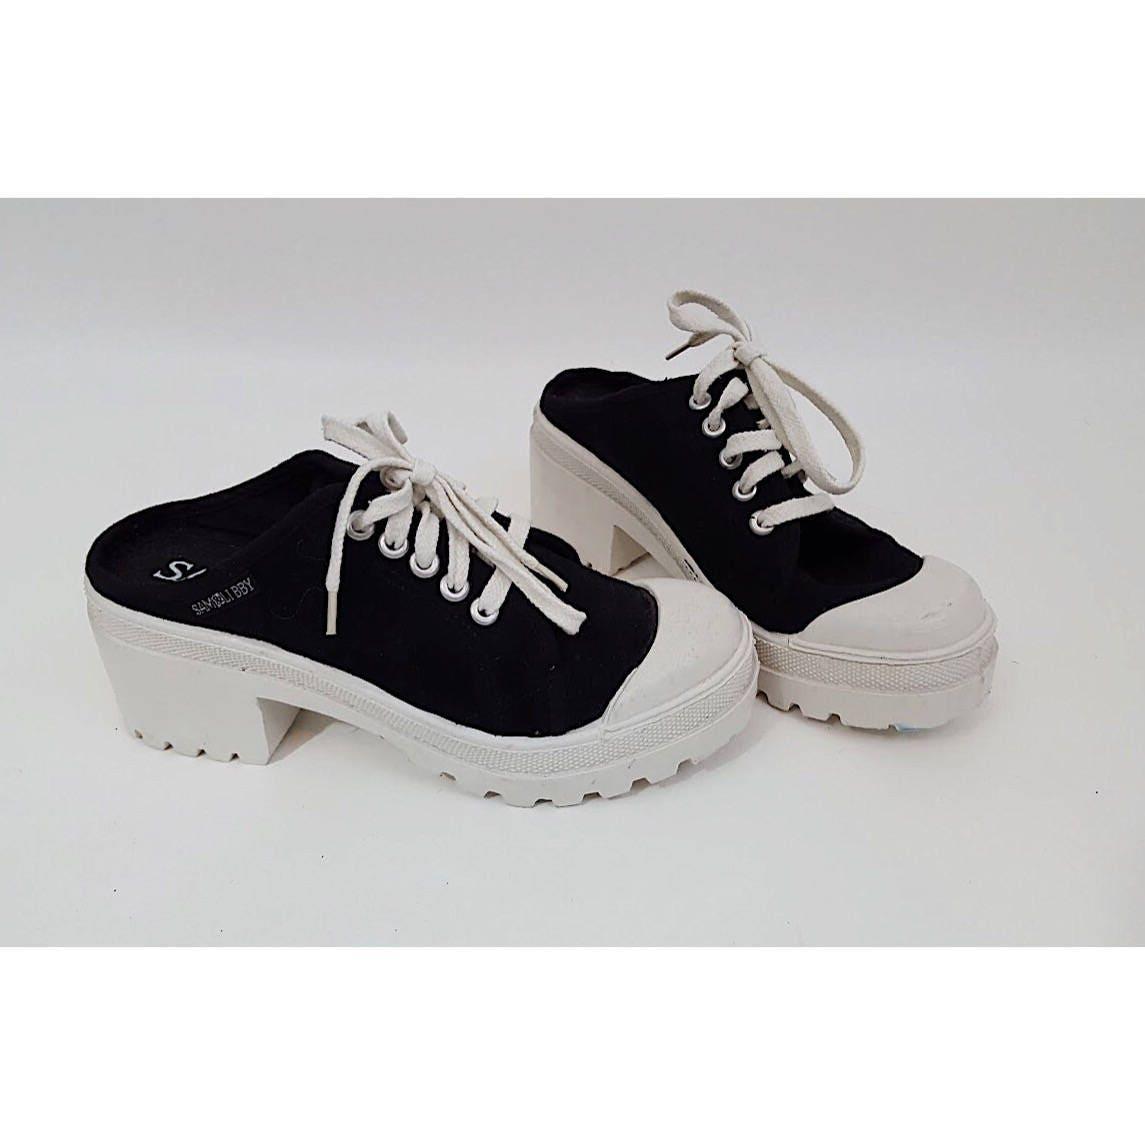 slip on tennis sko no back low price